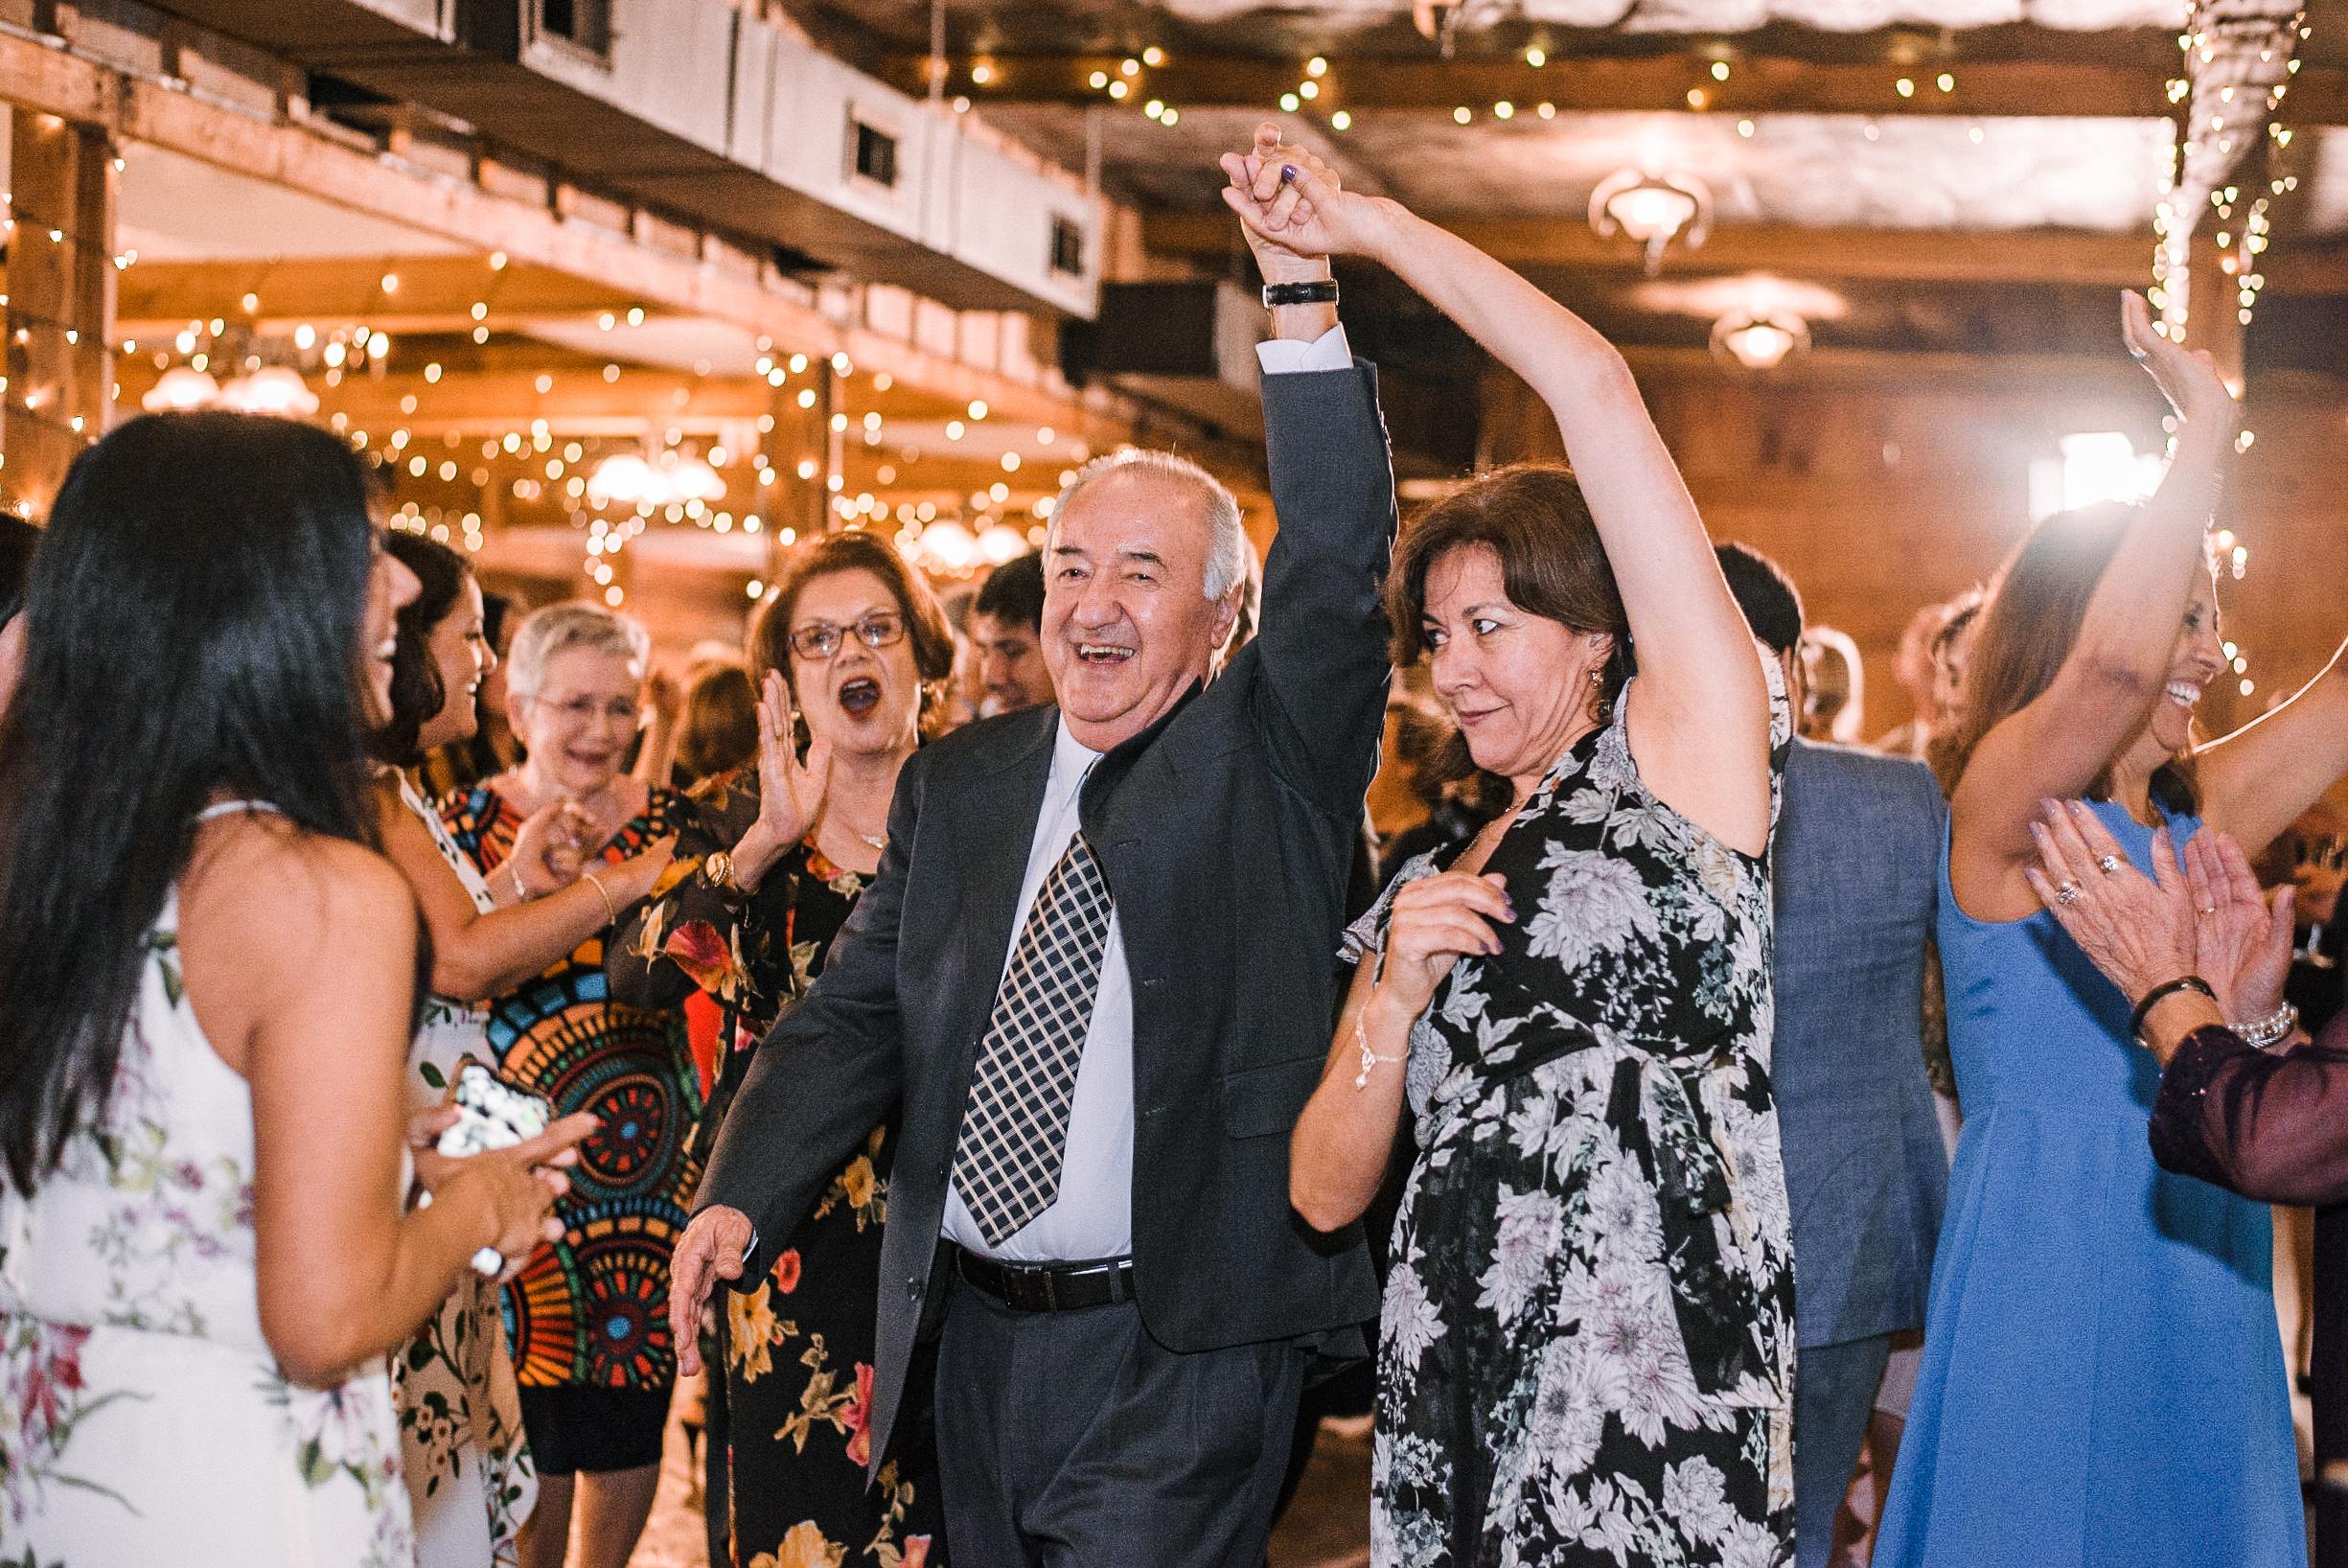 guests dancing at wedding reception at Bluemont Vineyard